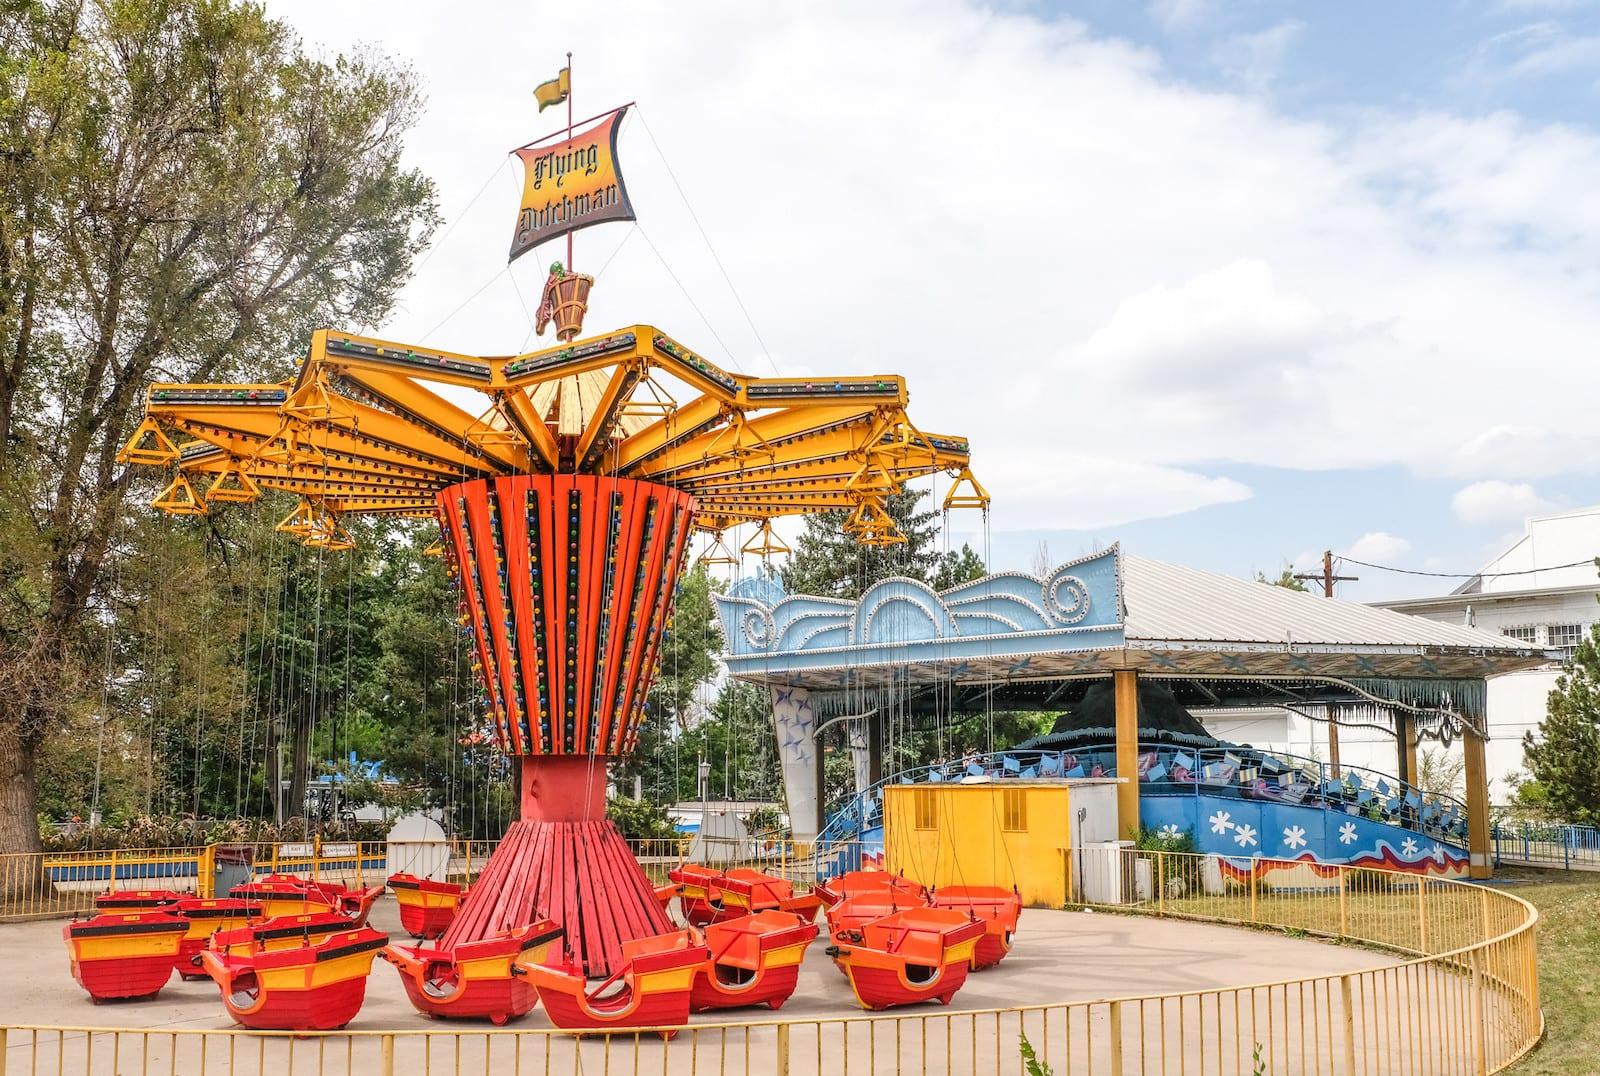 Flying Dutchman Lakeside Amusement Park Denver, Colorado